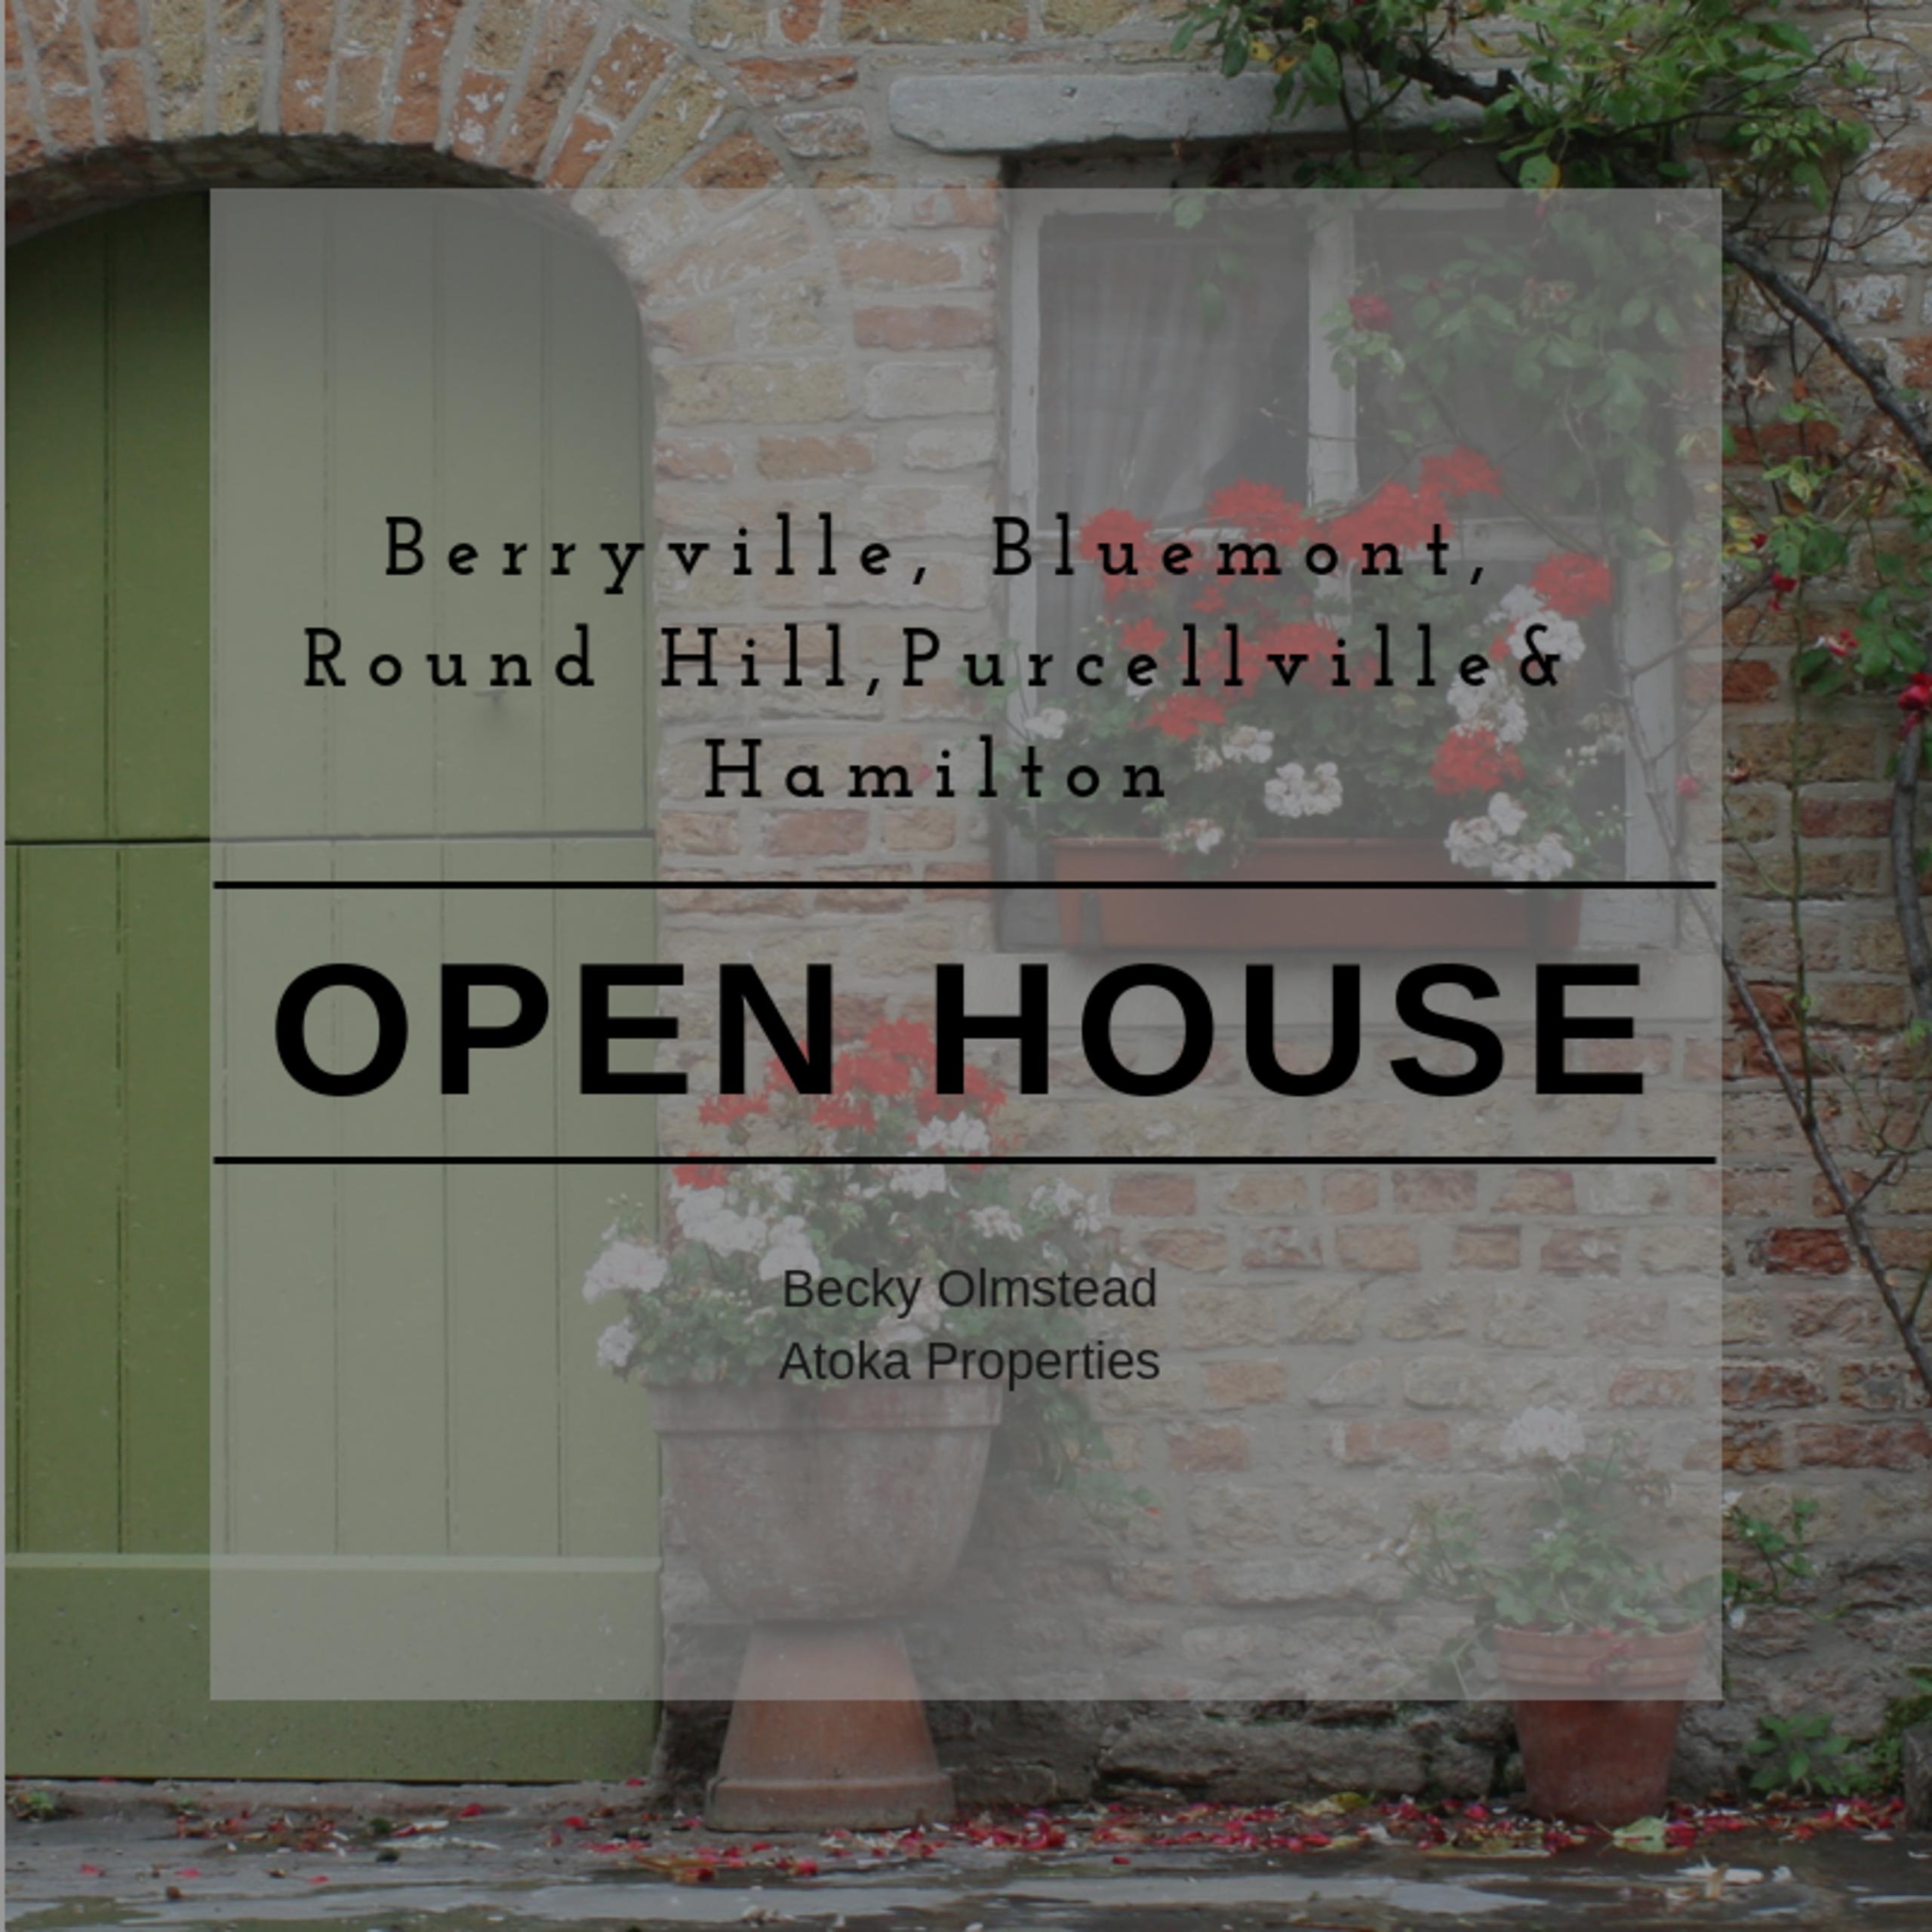 OPEN HOUSE LIST 9/27/18 – 9/28/18